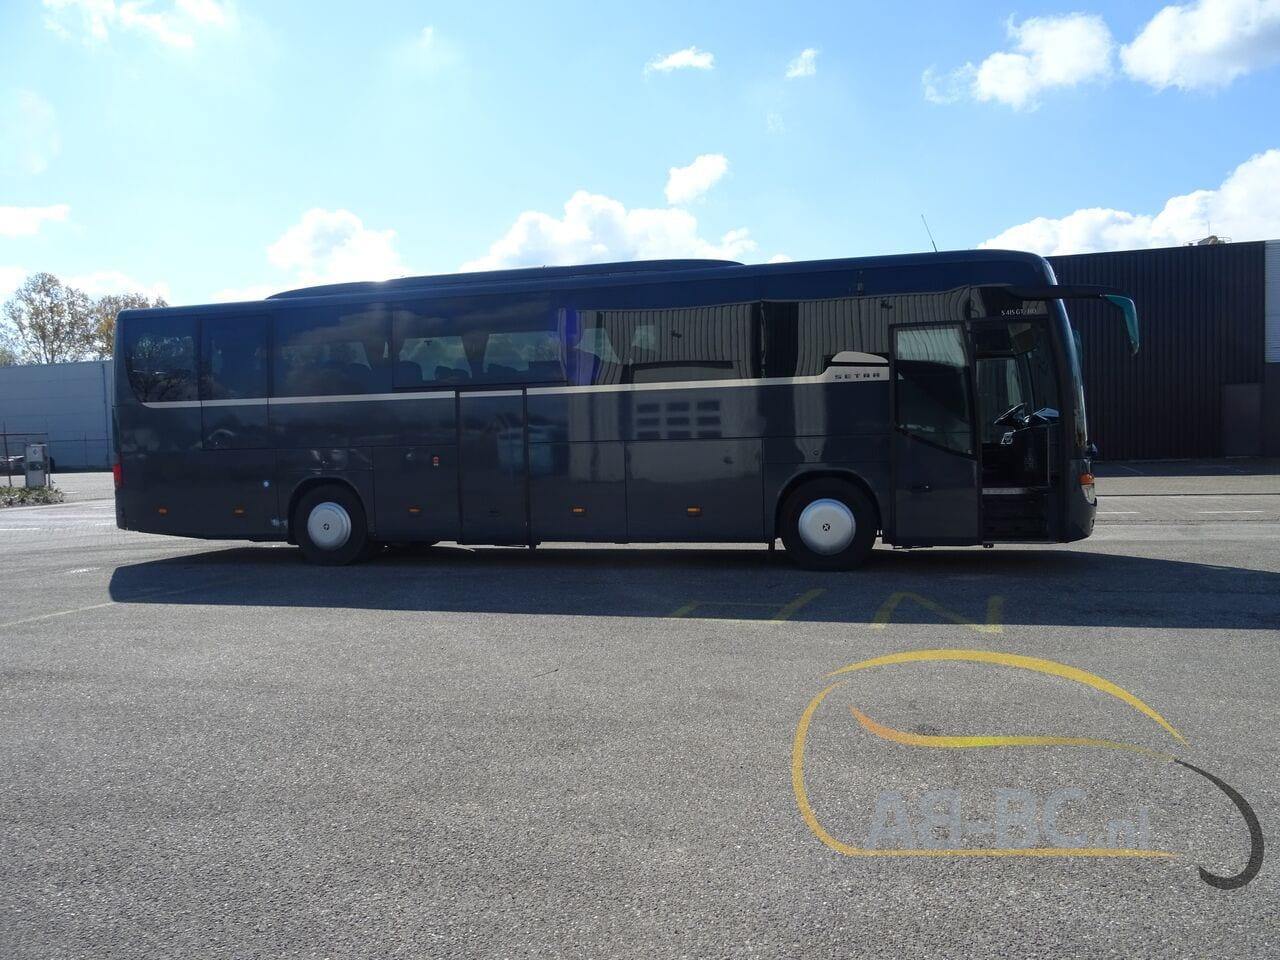 coach-busSETRA-S415-GT-HD-FINAL-EDITION-51-SEATS-LIFTBUS---1620381801285886174_big_7b5dc1baad5364595ce6e462447592ee--21050713010665719300